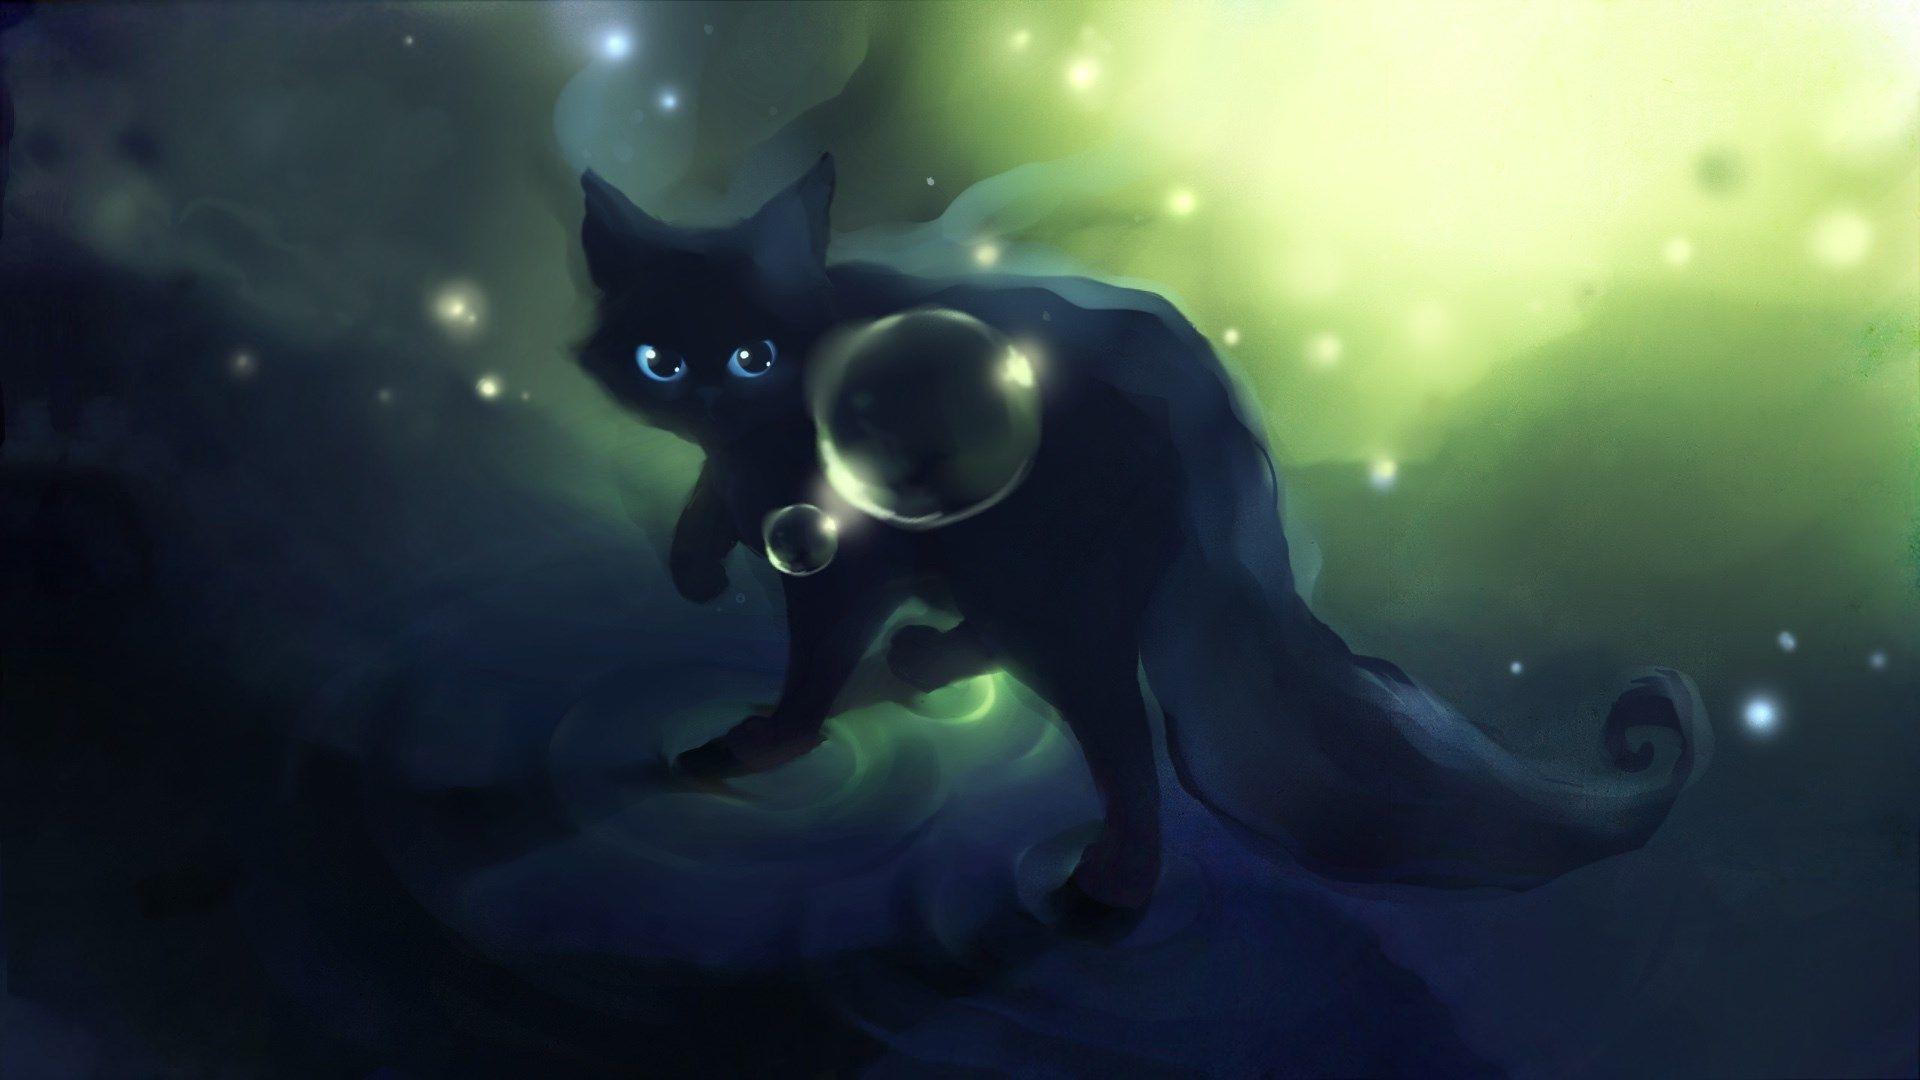 Anime Black Cat Wallpaper 1920x1080